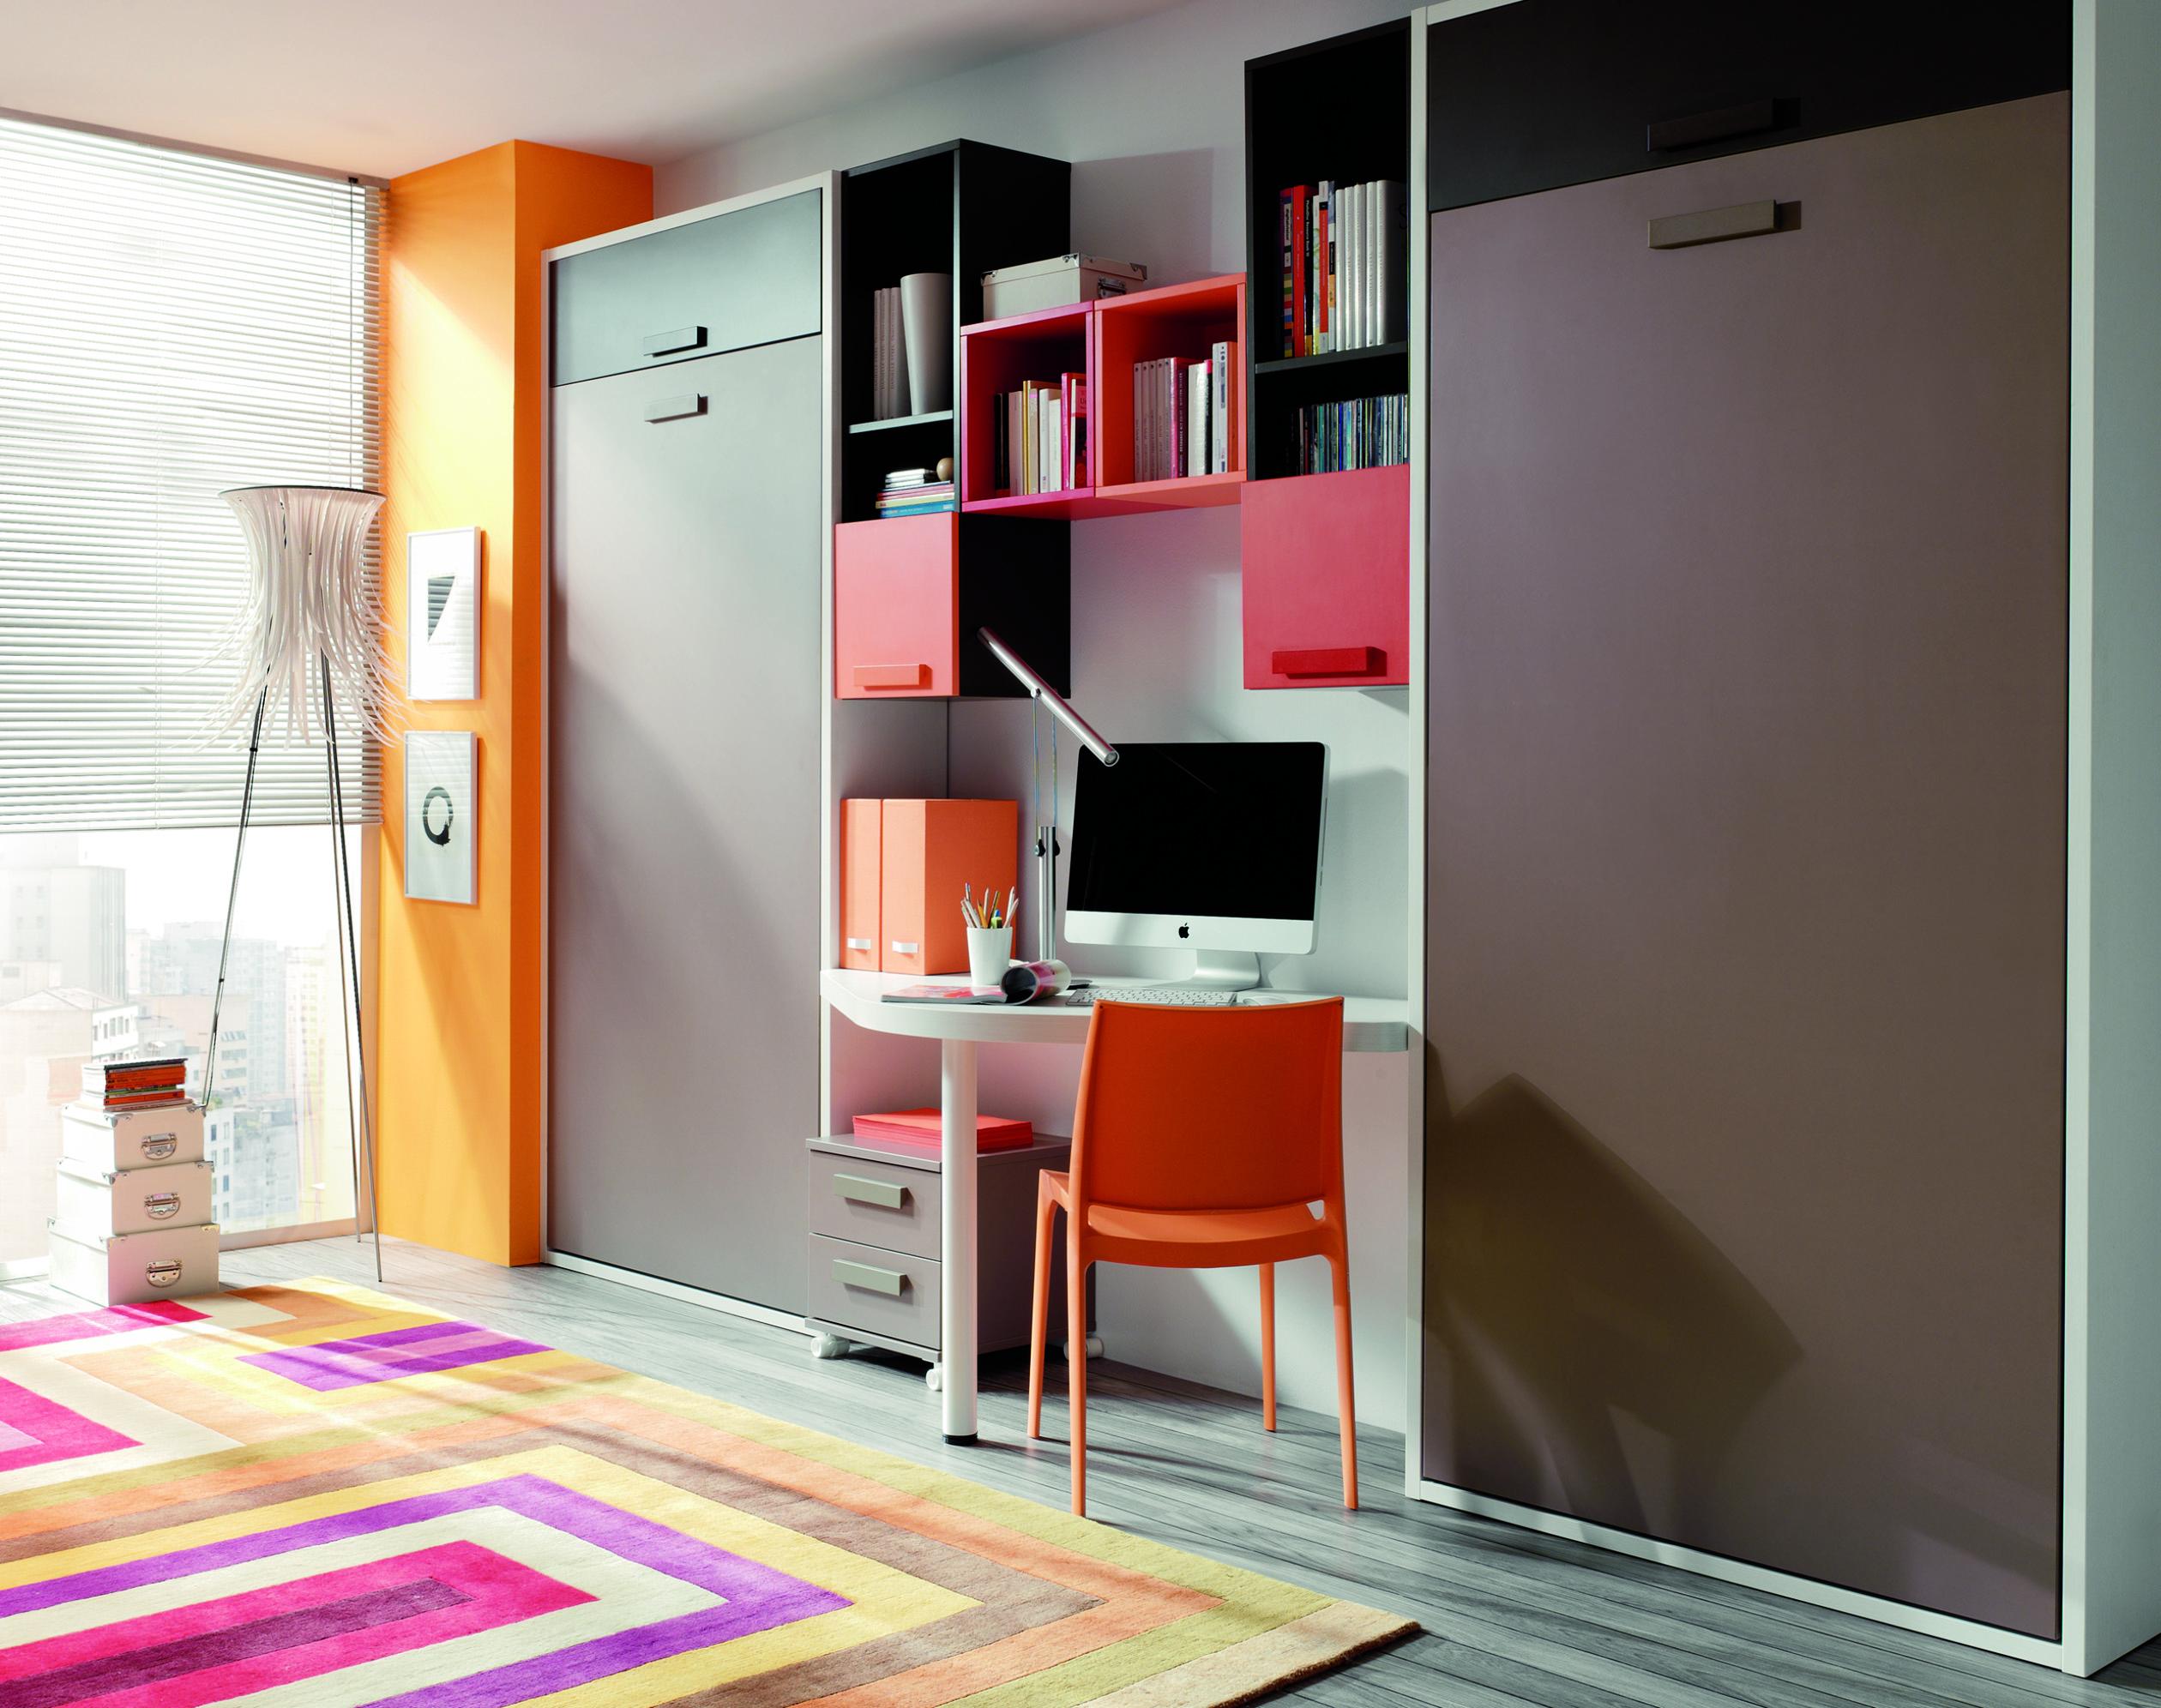 Camas Abatibles Jjp Mobel Madrid Online ~ Camas Abatibles Horizontales Ikea